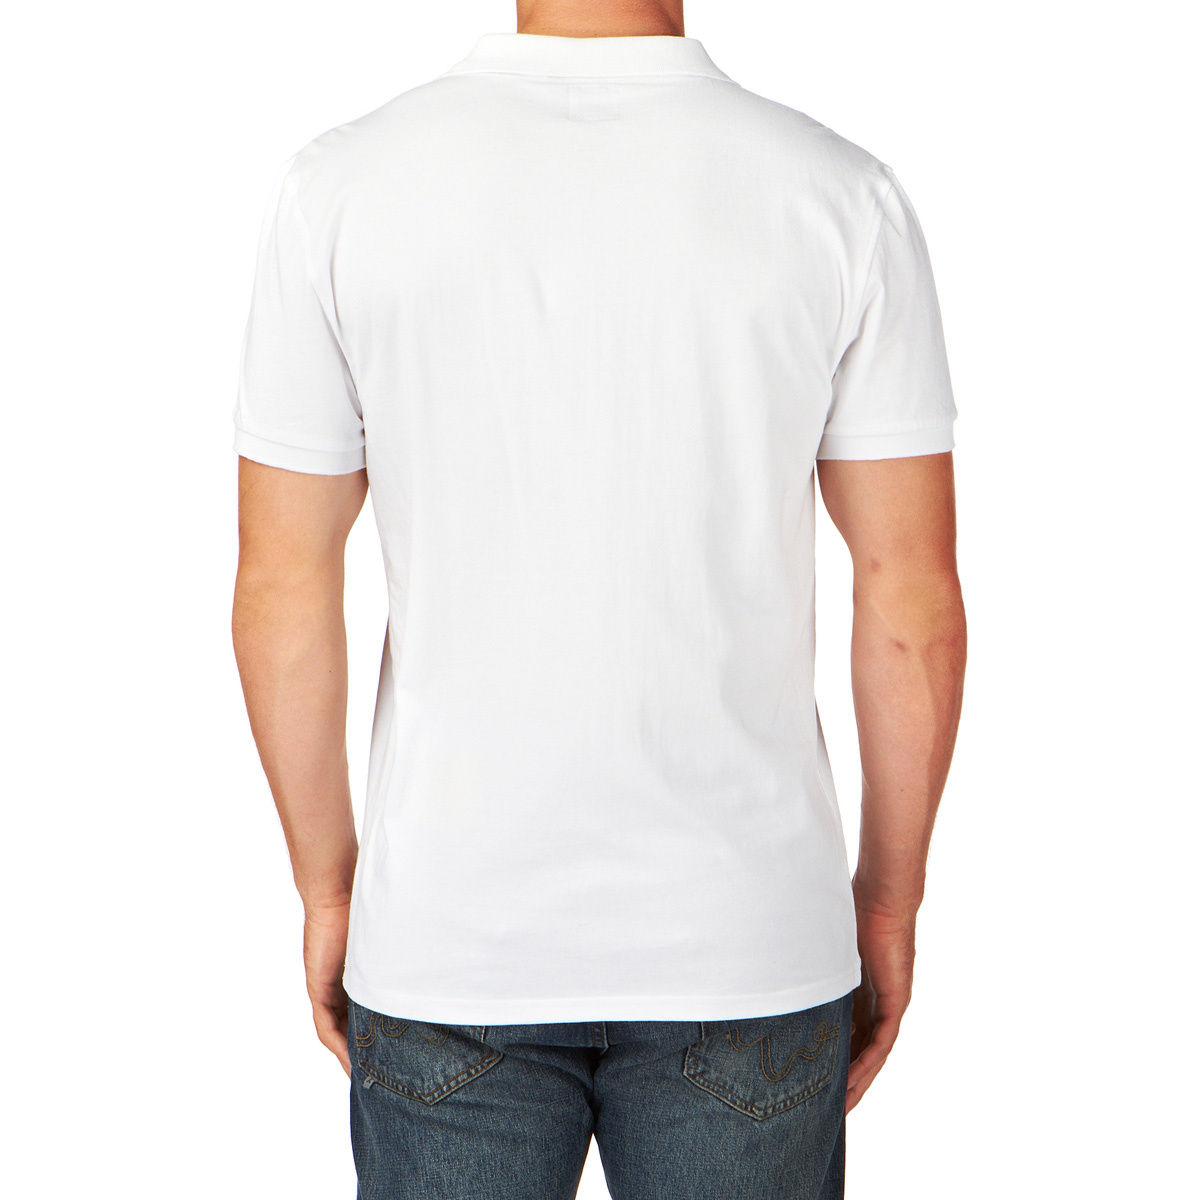 New Design White Collar T Shirt Buy White Collar T Shirt